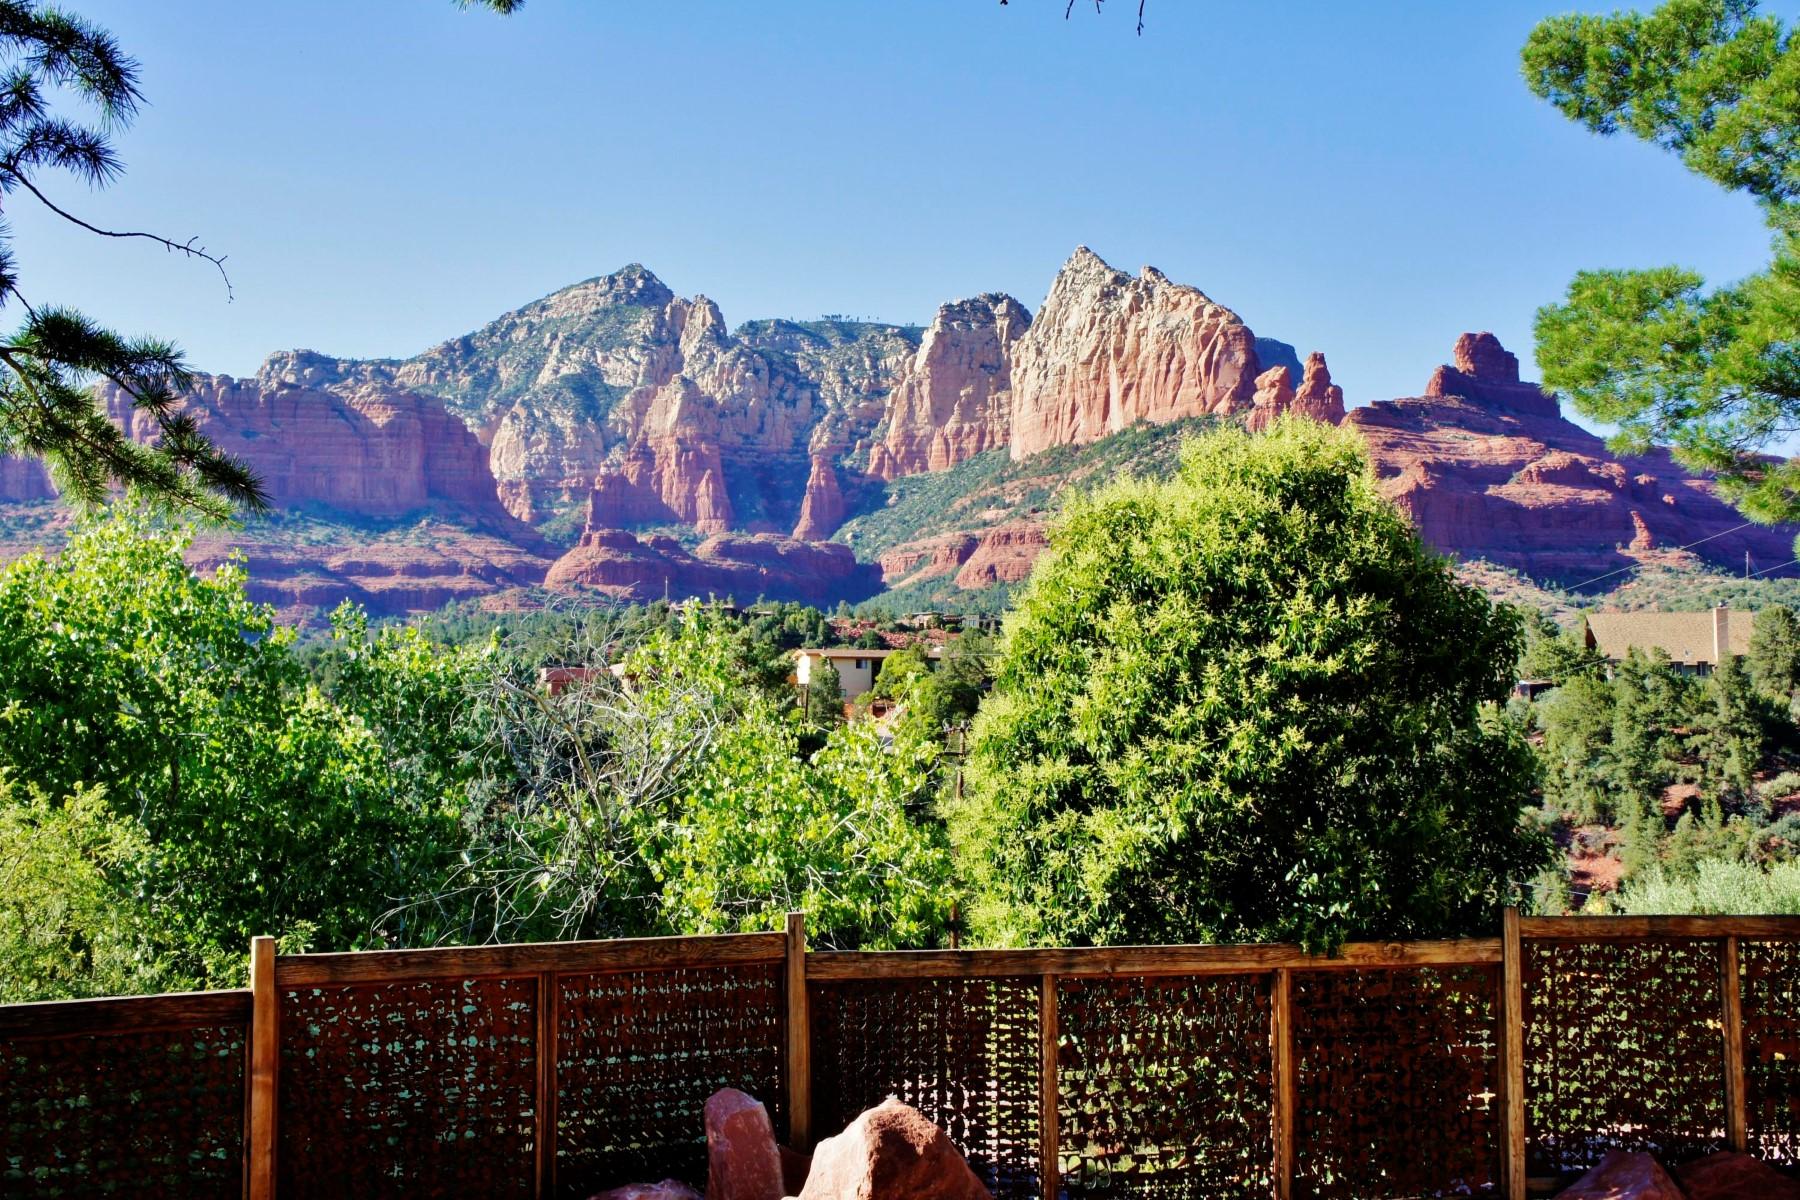 Single Family Home for Sale at Beautifully distinctive home with panoramic views. 583 Circle Drive Sedona, Arizona 86336 United States